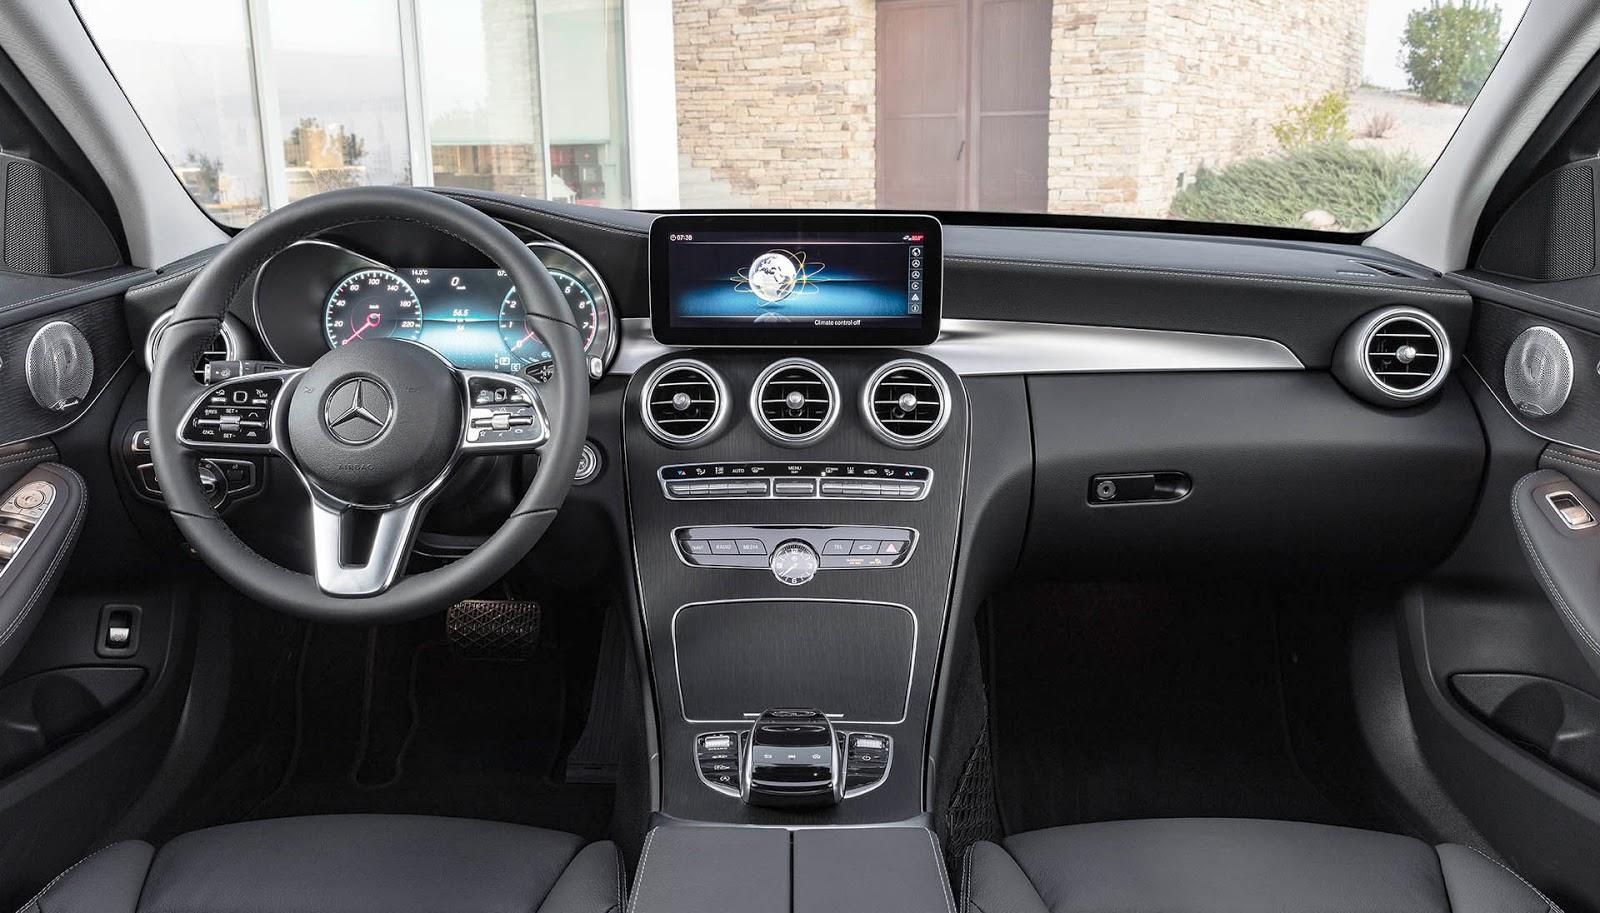 novità interni nuova mercedes classe c 2018 restyling